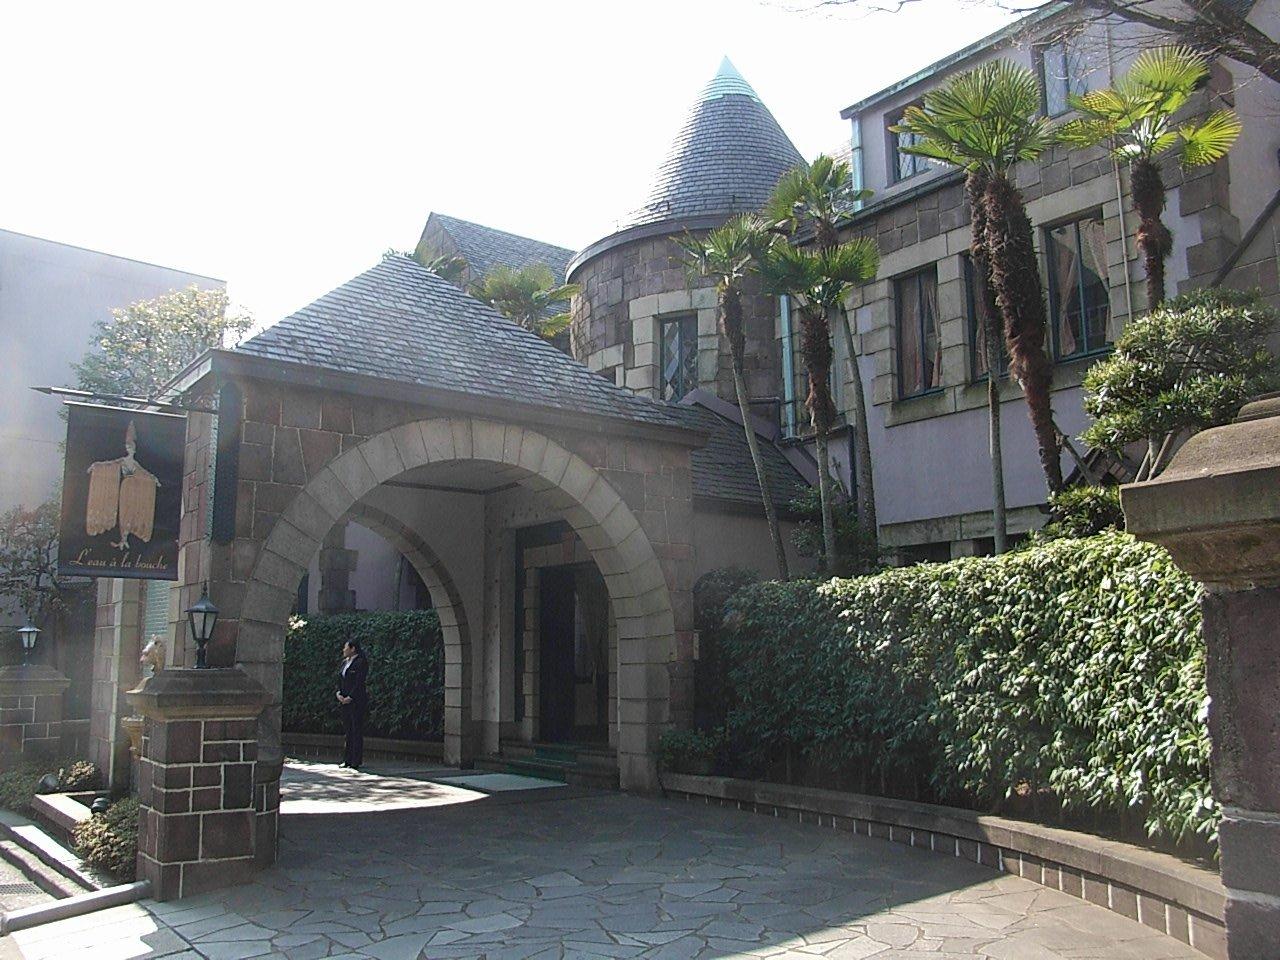 a1633e9e.jpg?resize=1200,630 - 鬼嫁北斗晶さんの家はまるでお城?意外にも西洋風の豪邸でした